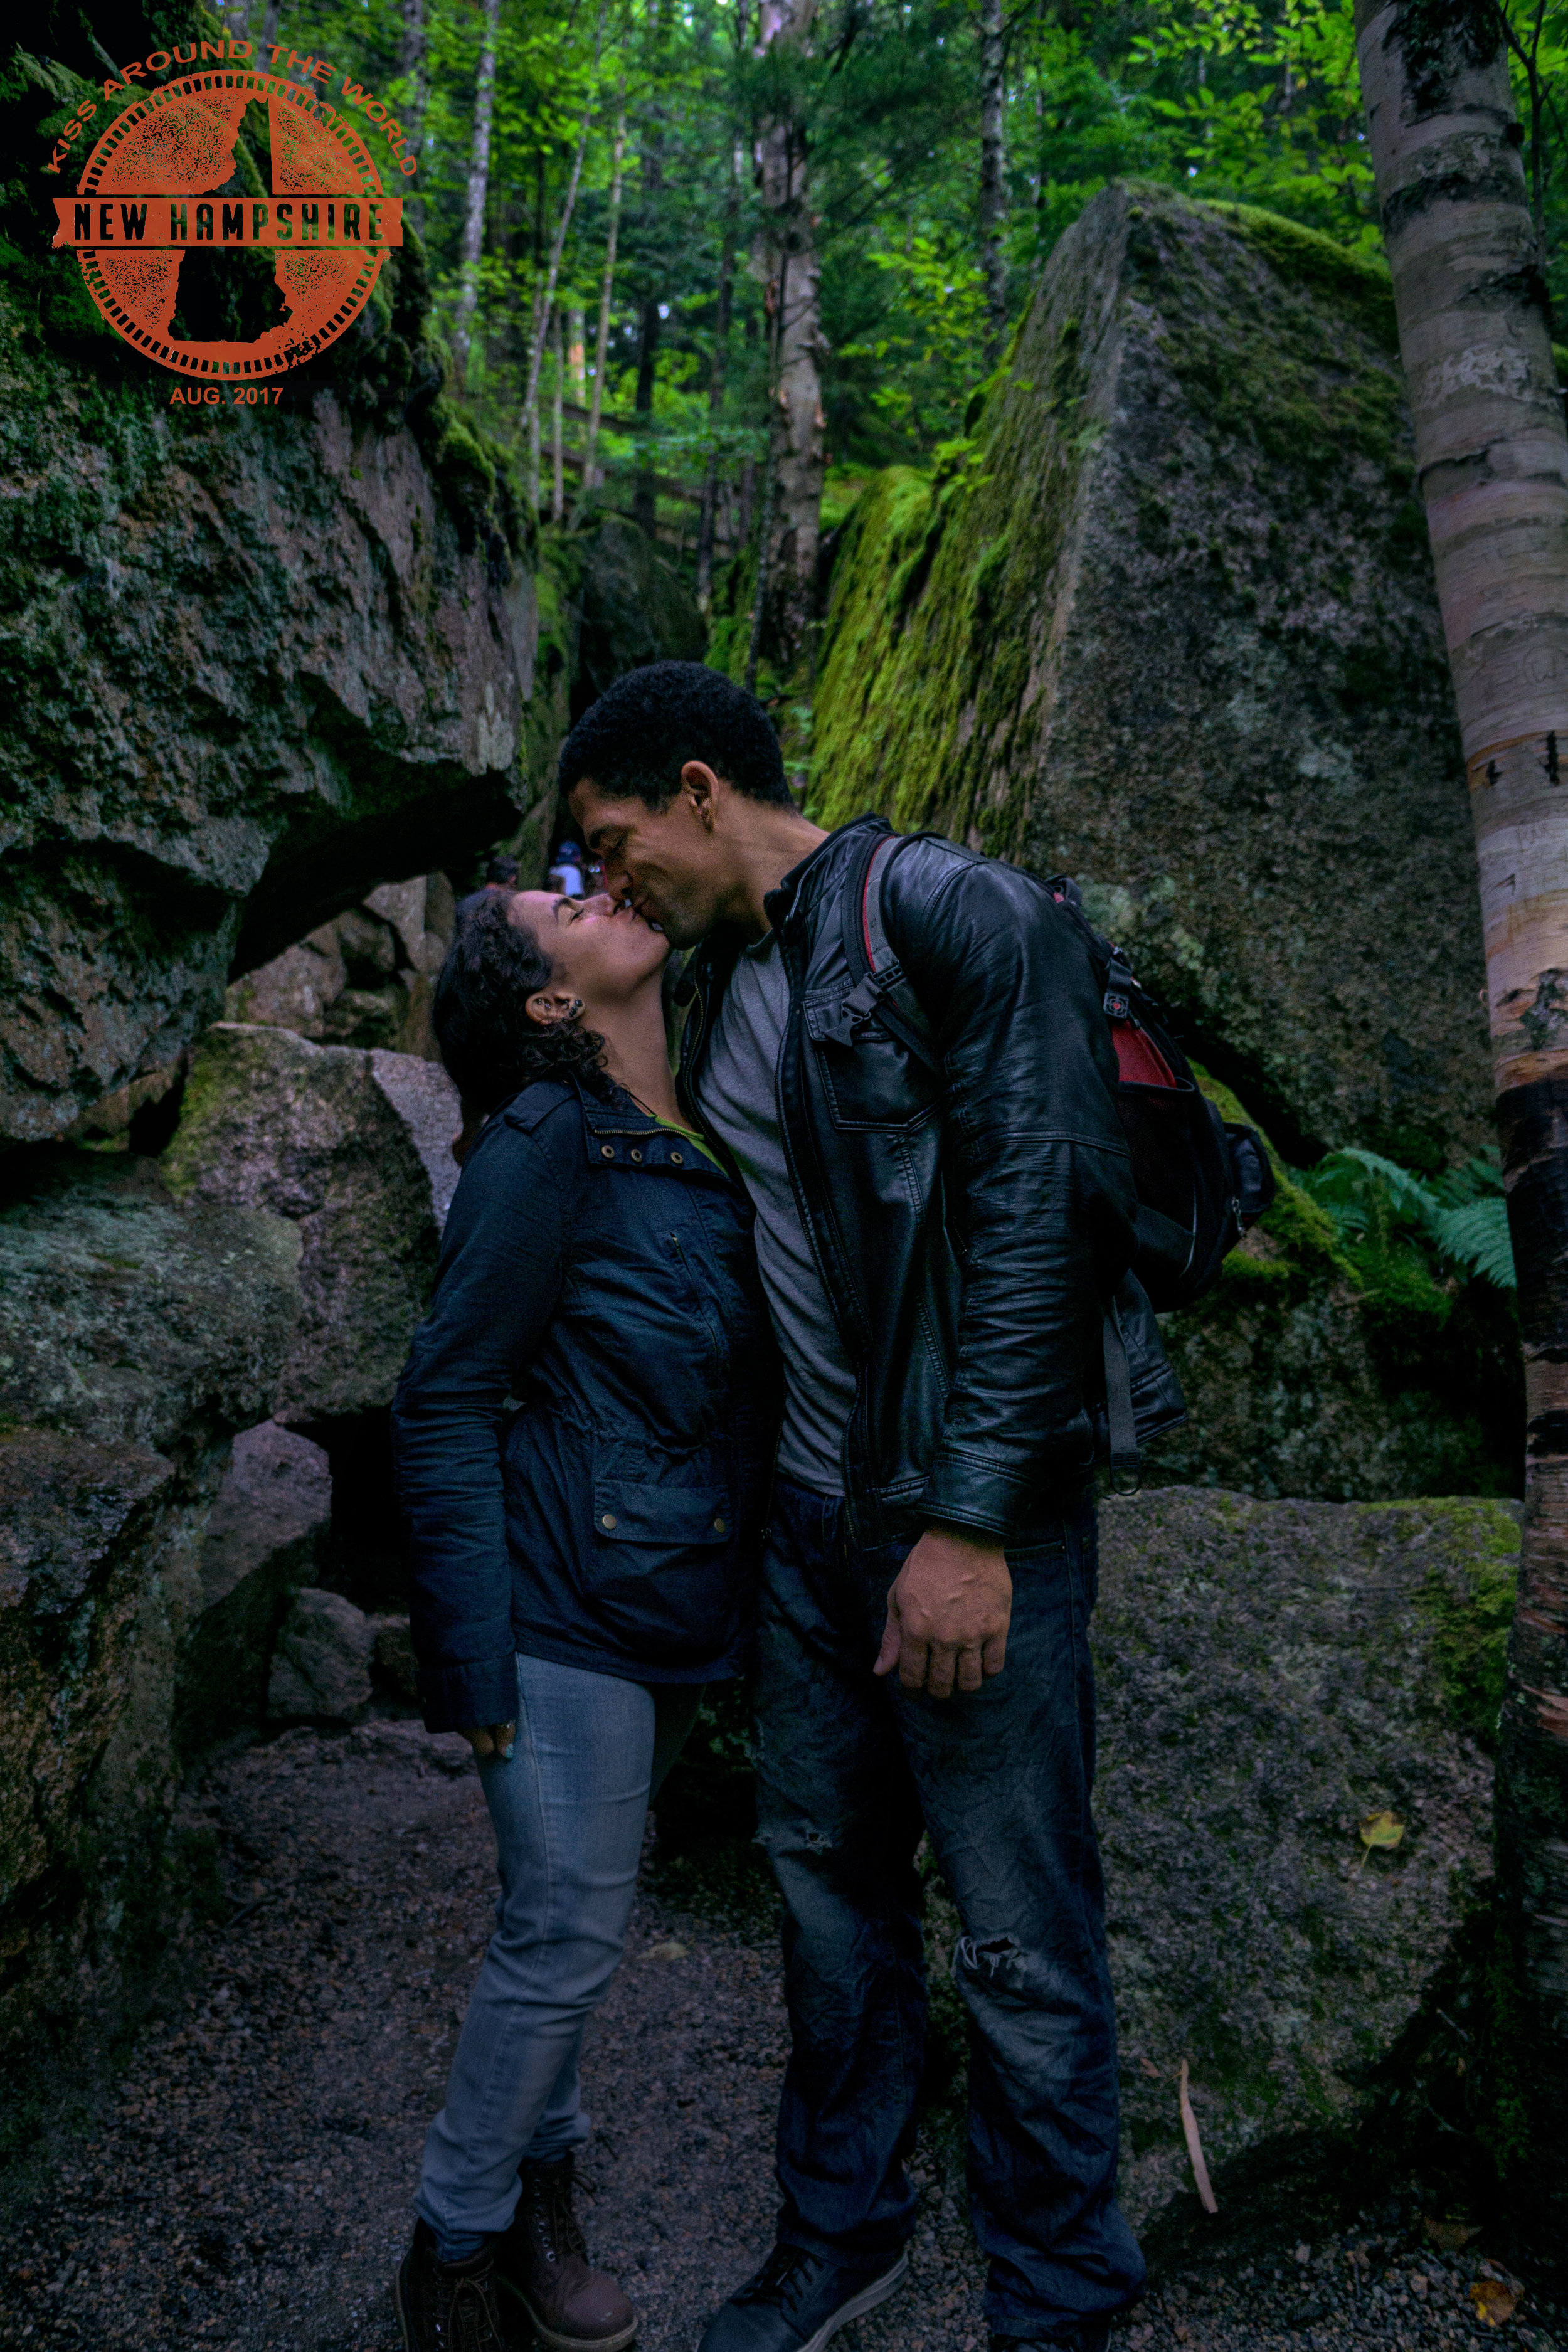 vickygood_photography_NH_travel_kissjpg.jpg